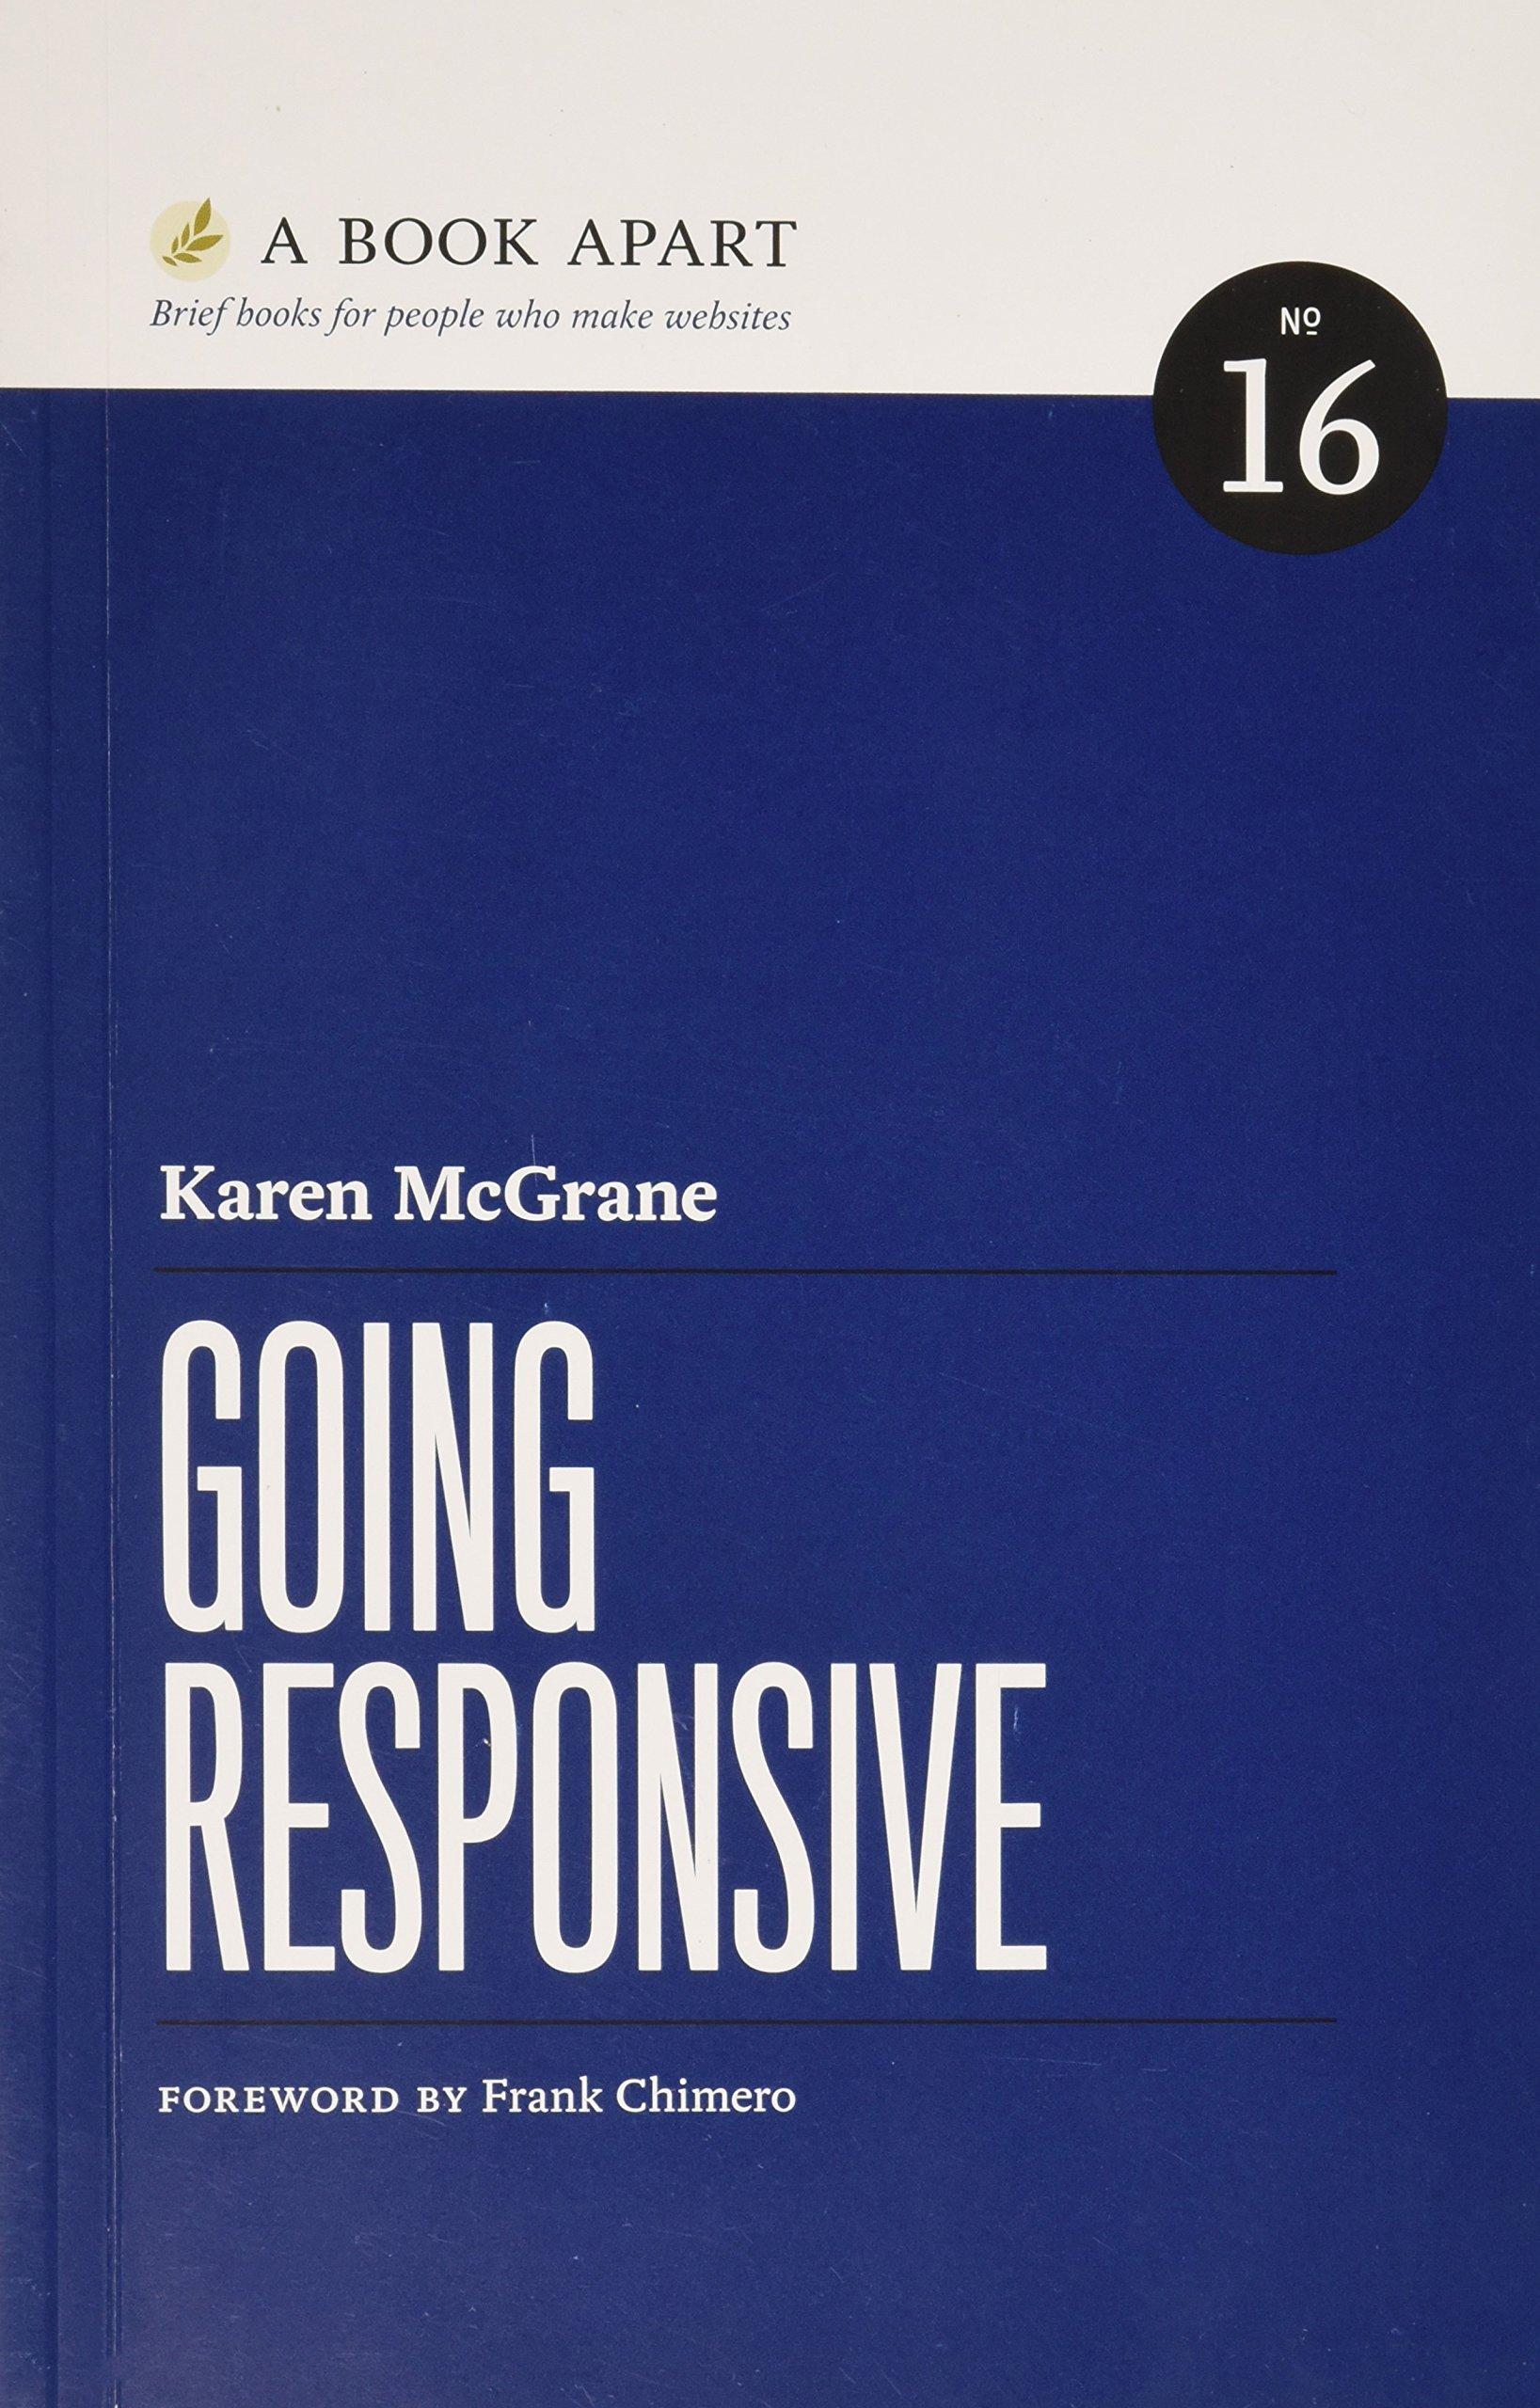 A BOOK APART RESPONSIVE EBOOK